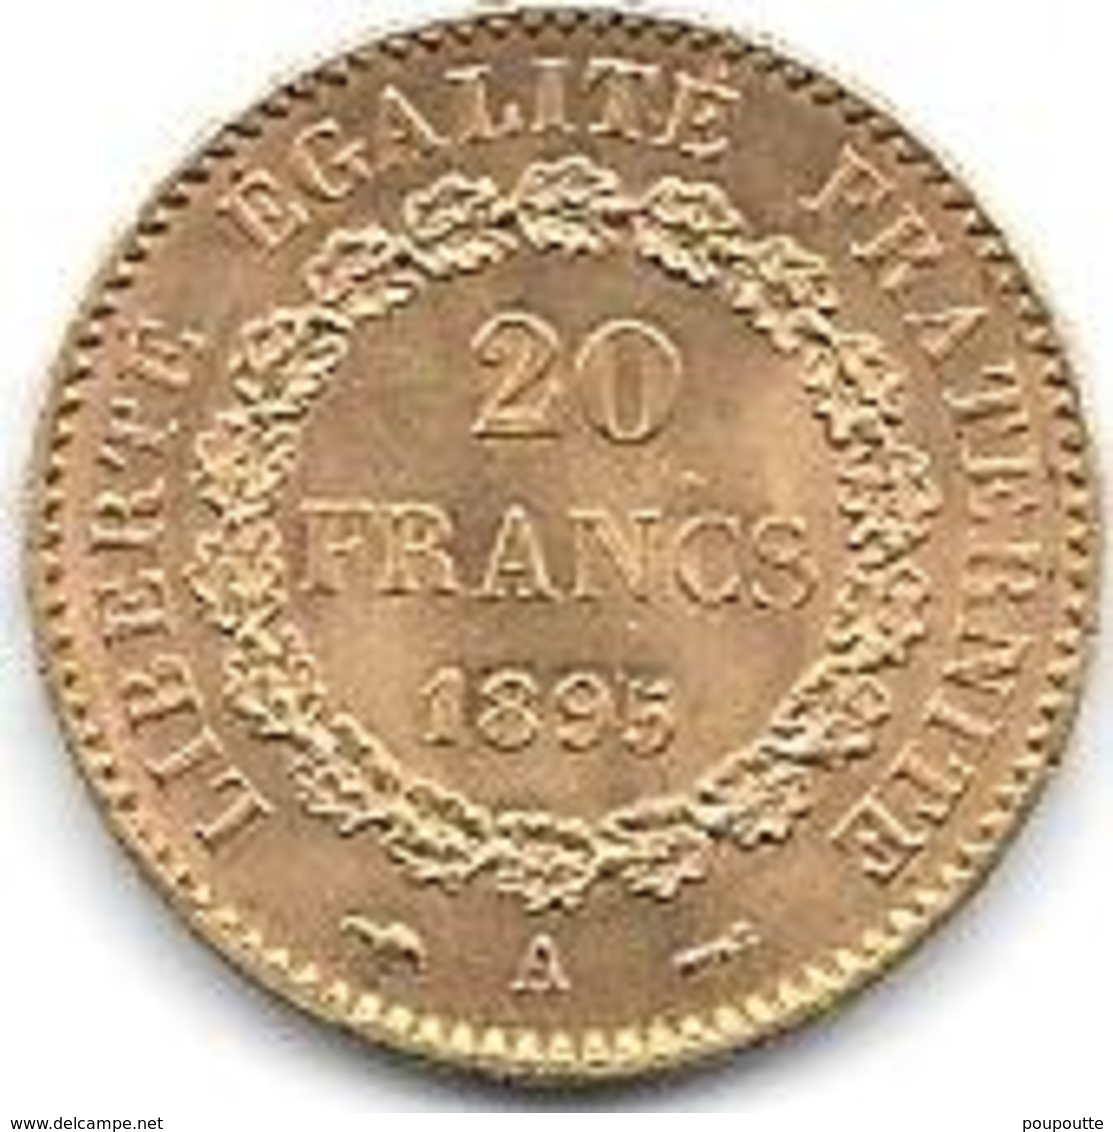 20 Frs OR FRANCE TYPE GENIE DEBOUT 1895 - Or